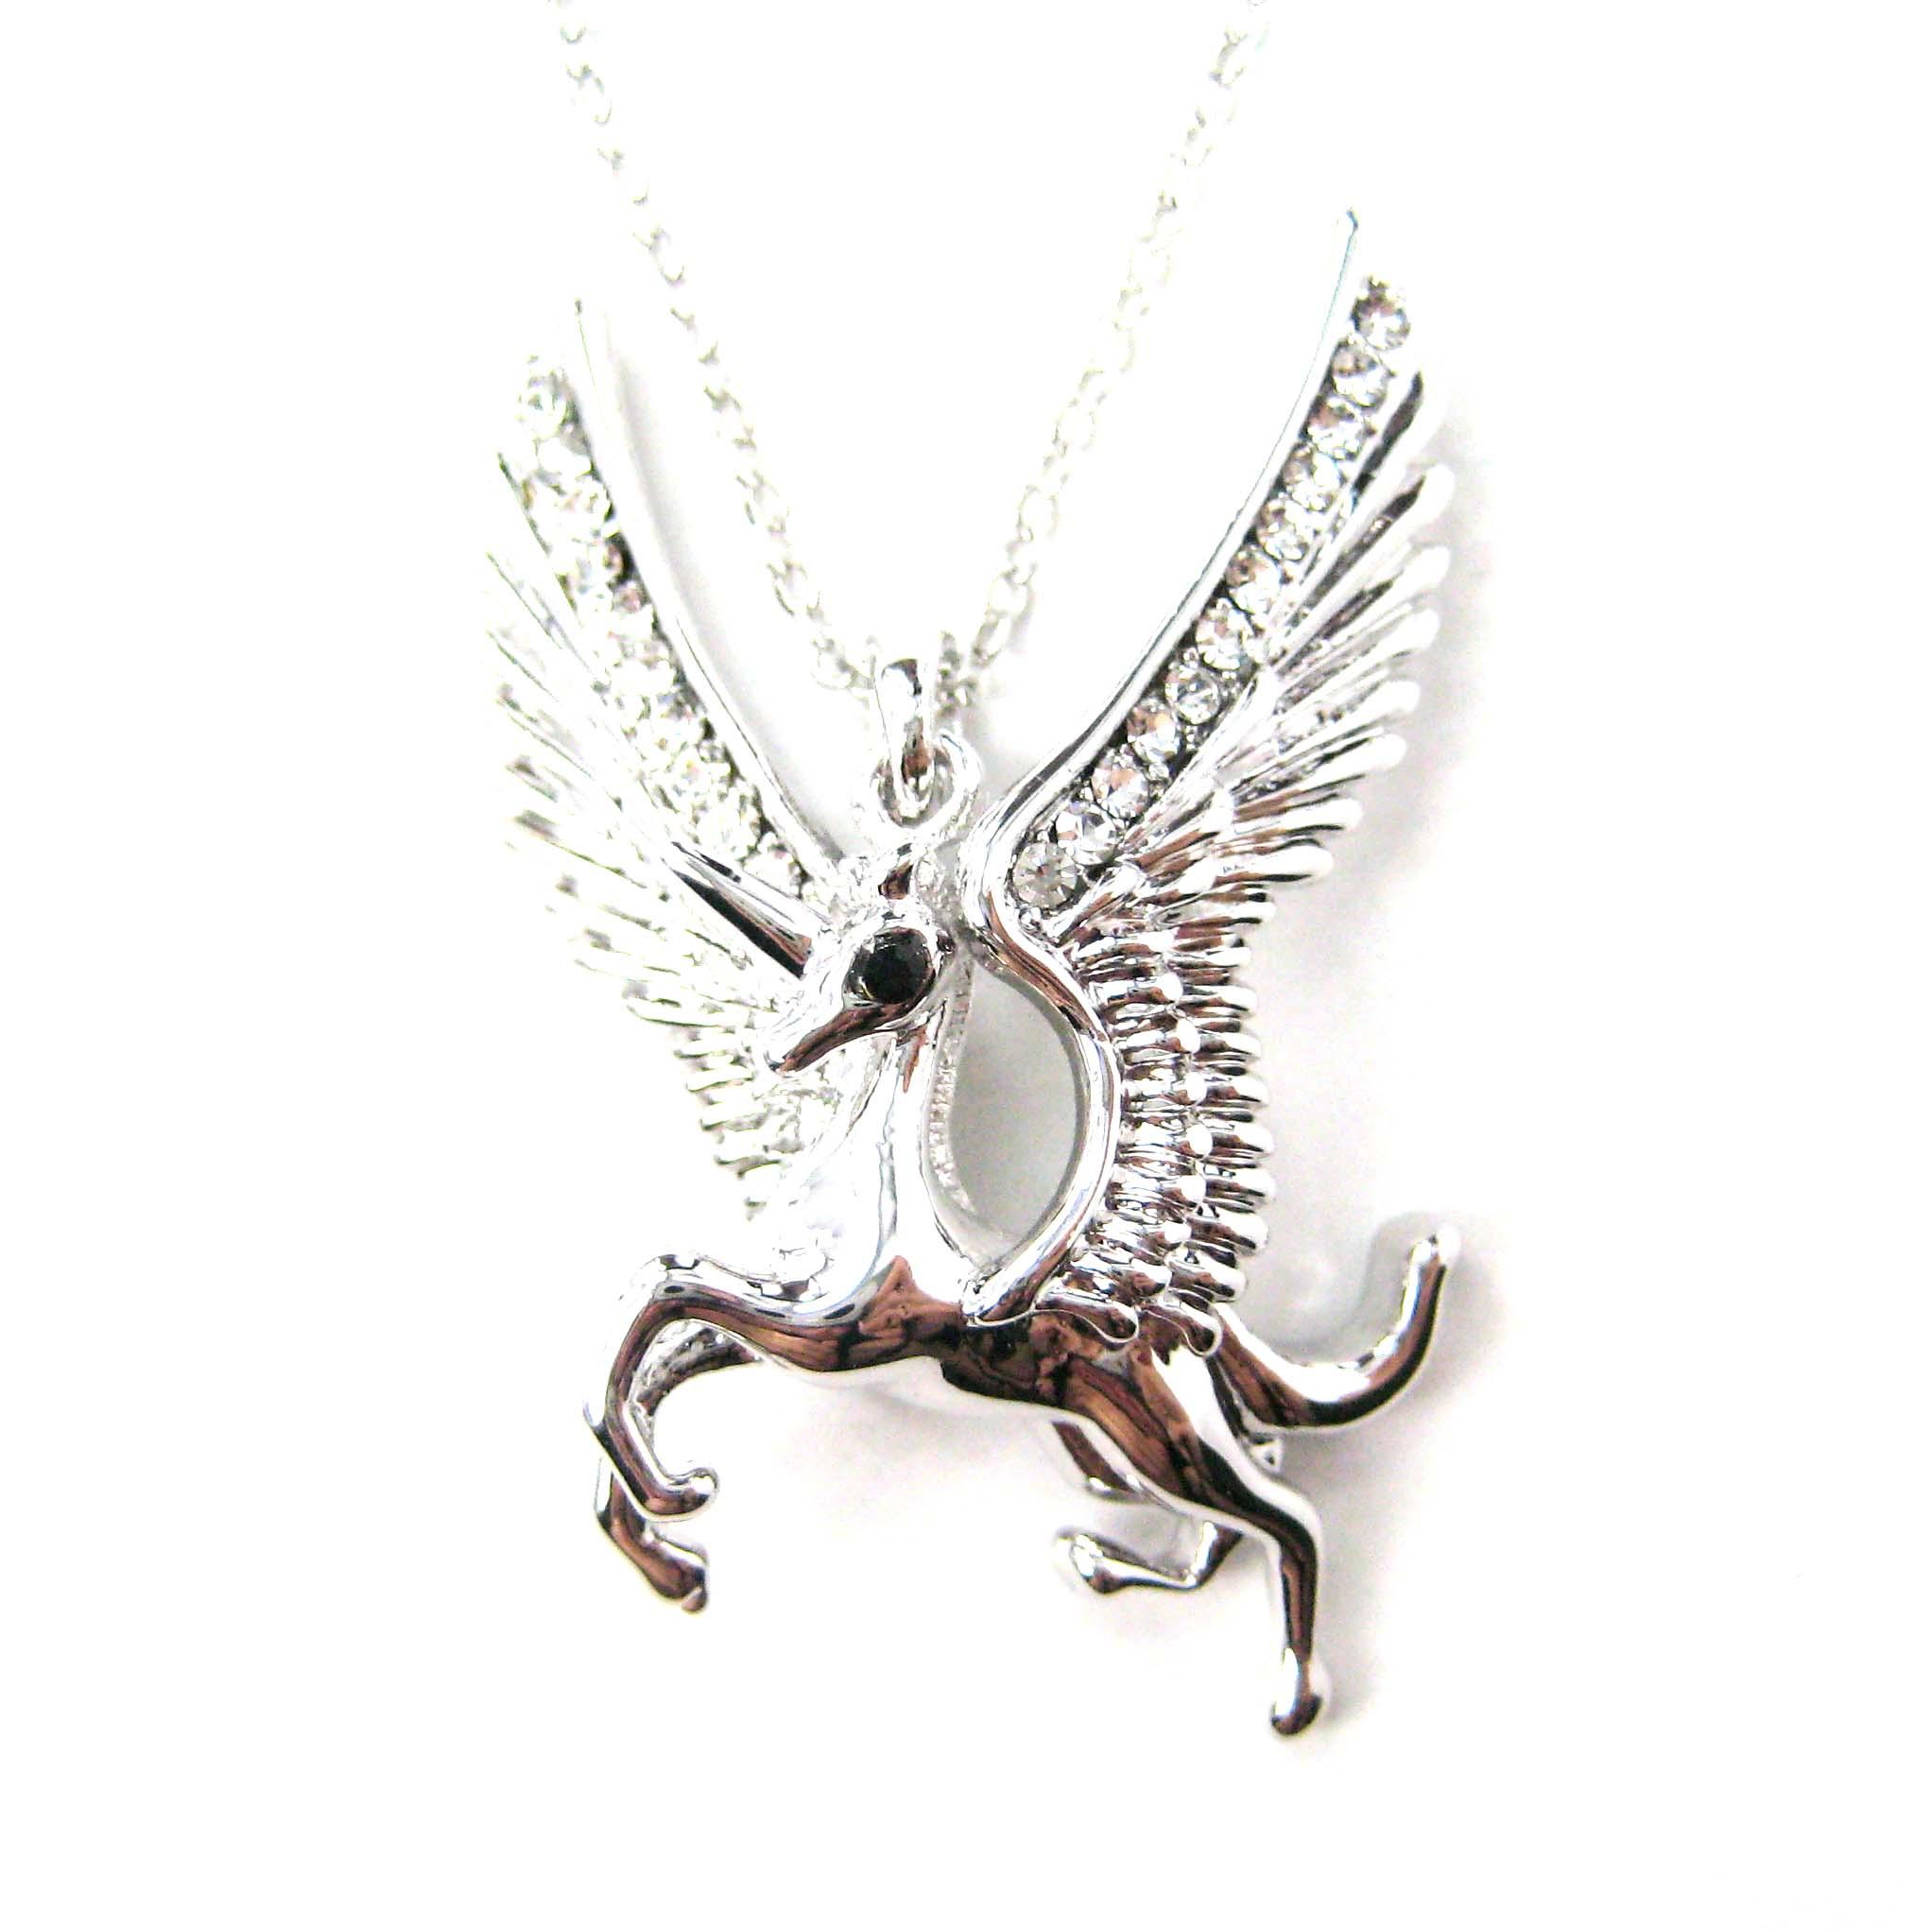 Pegasus Unicorn Shaped Animal Pendant Necklace In Silver